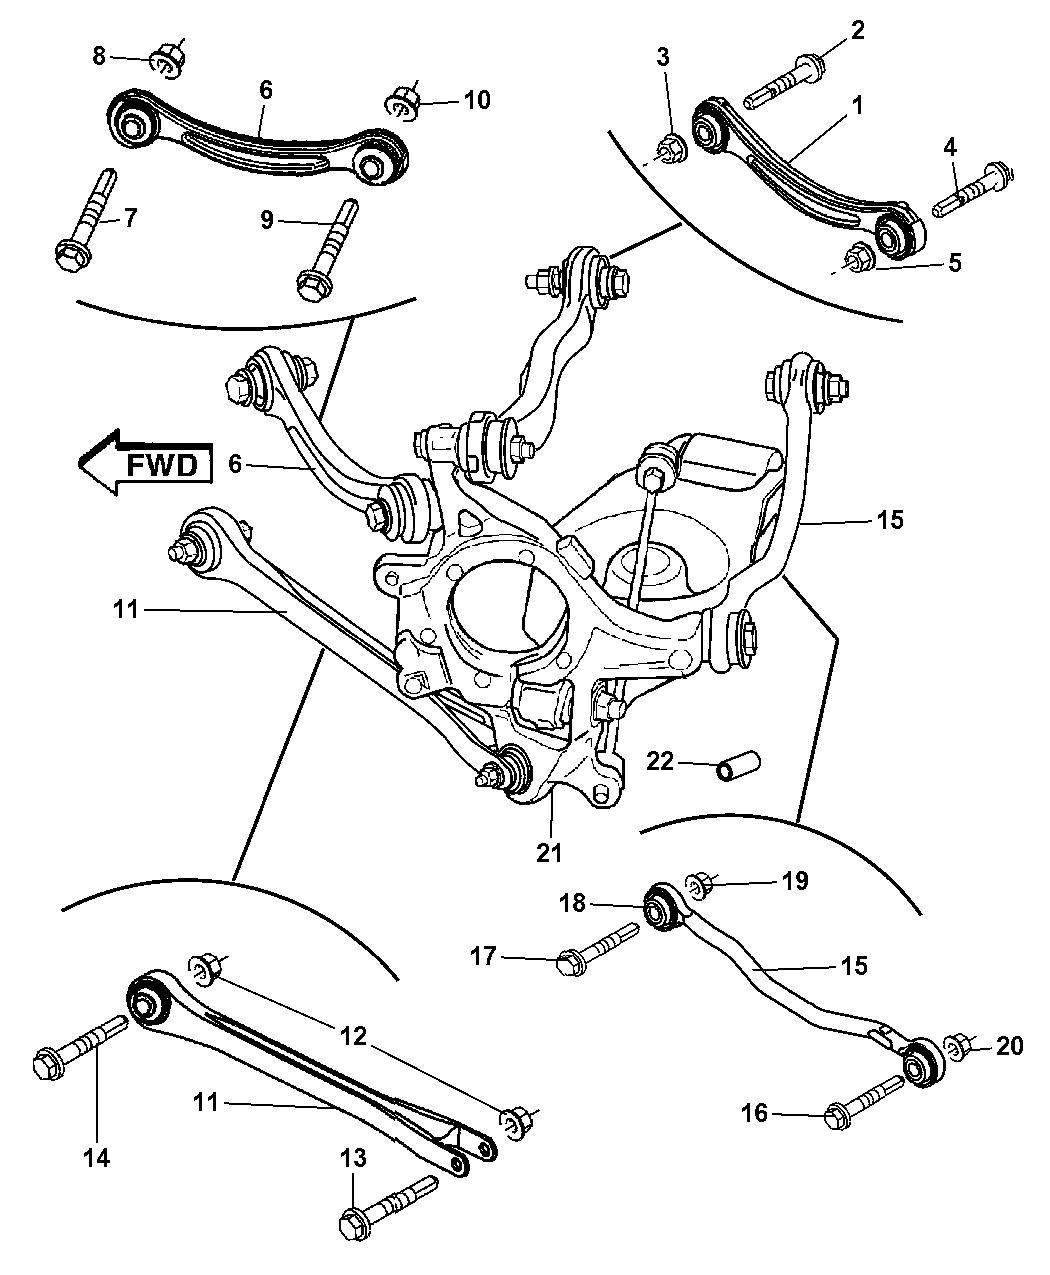 Dodge Charger Rear Suspension Diagram | Car Reviews 2018